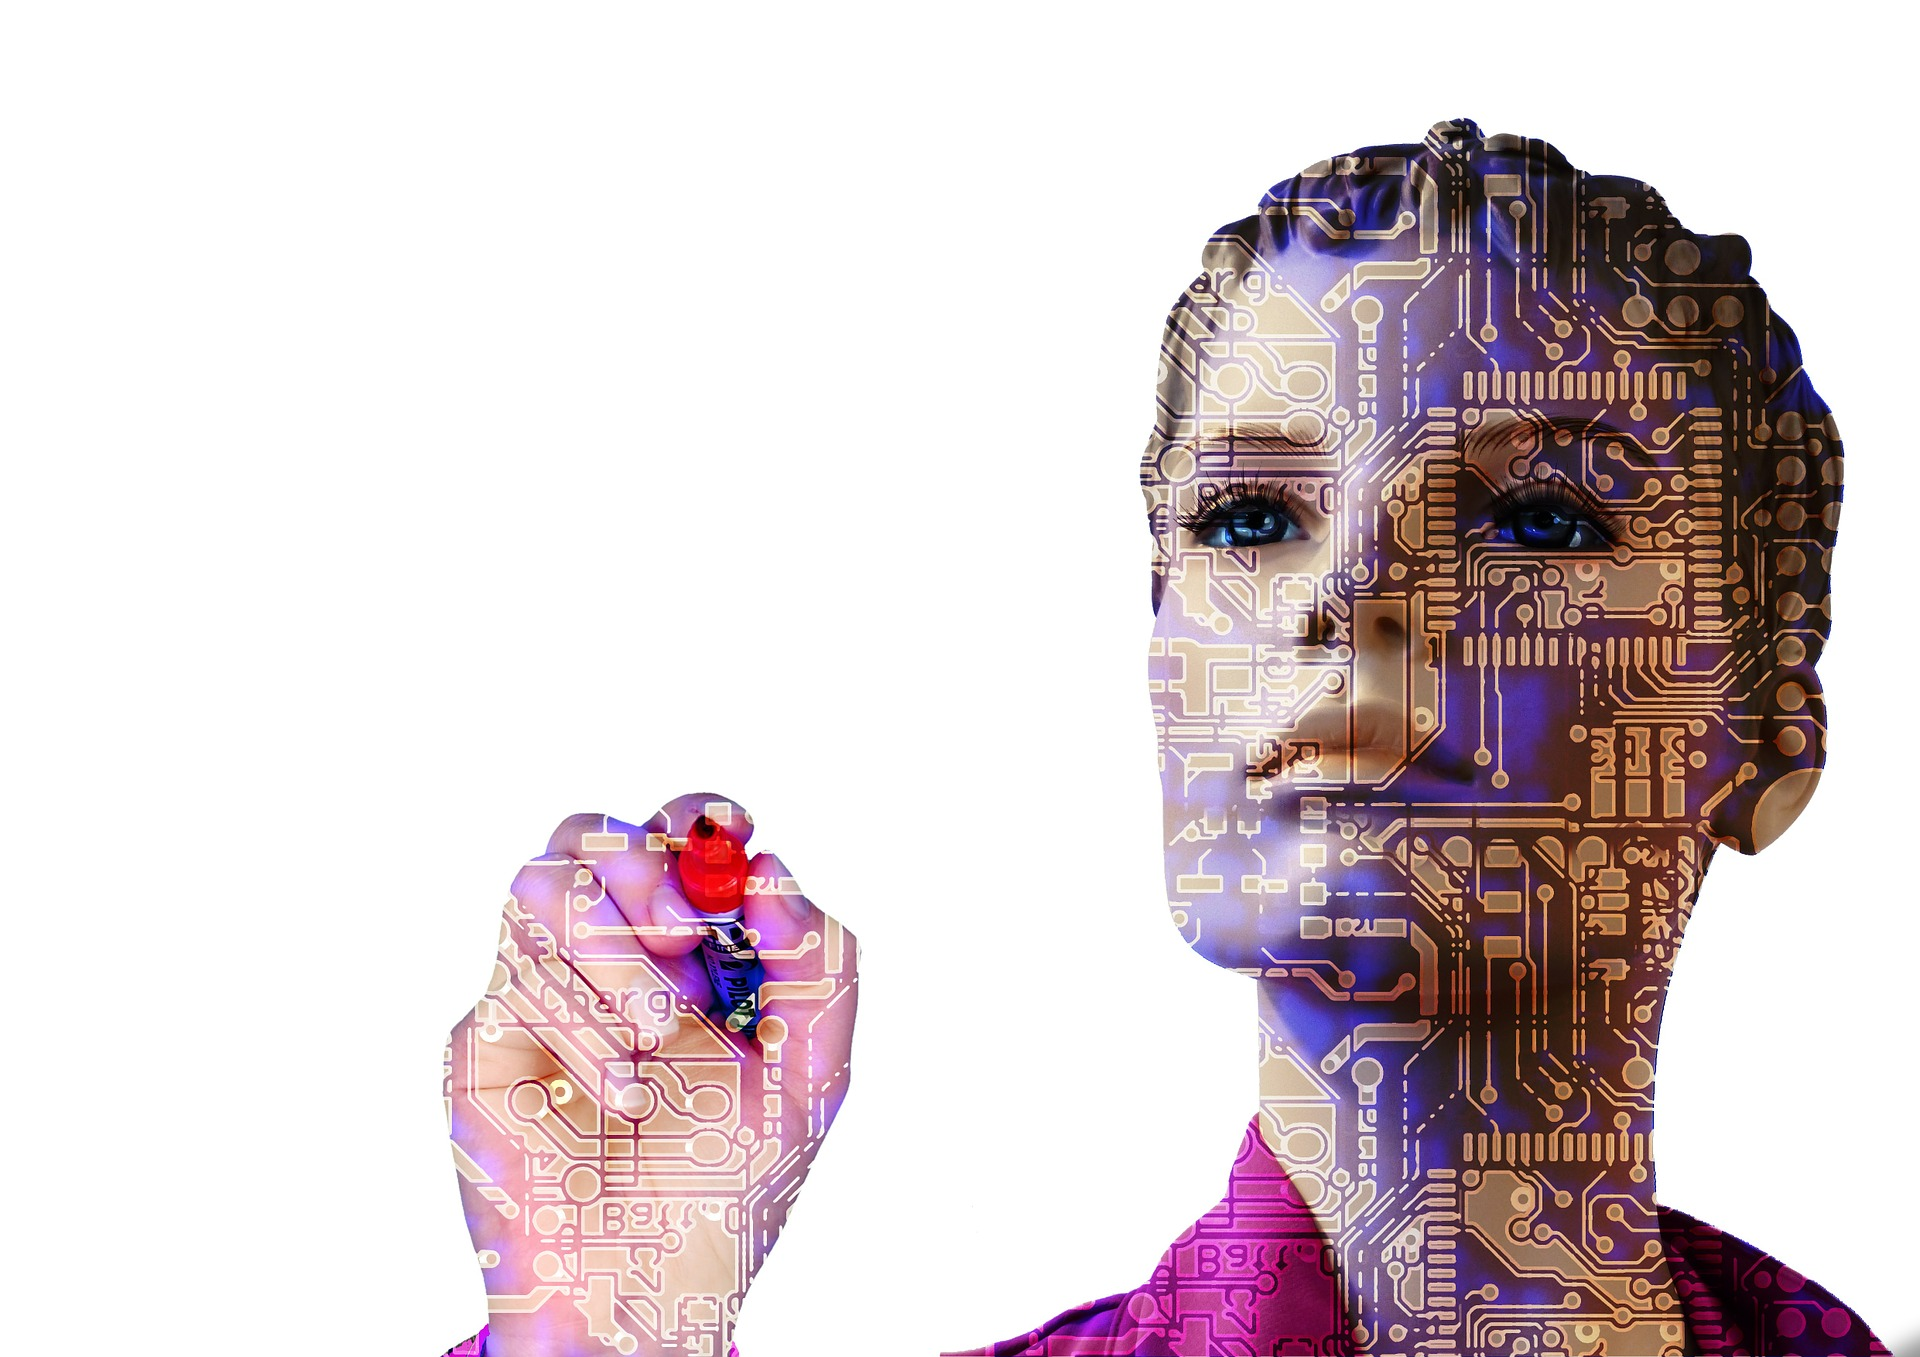 E-Commerce Companies: Using AI Technology